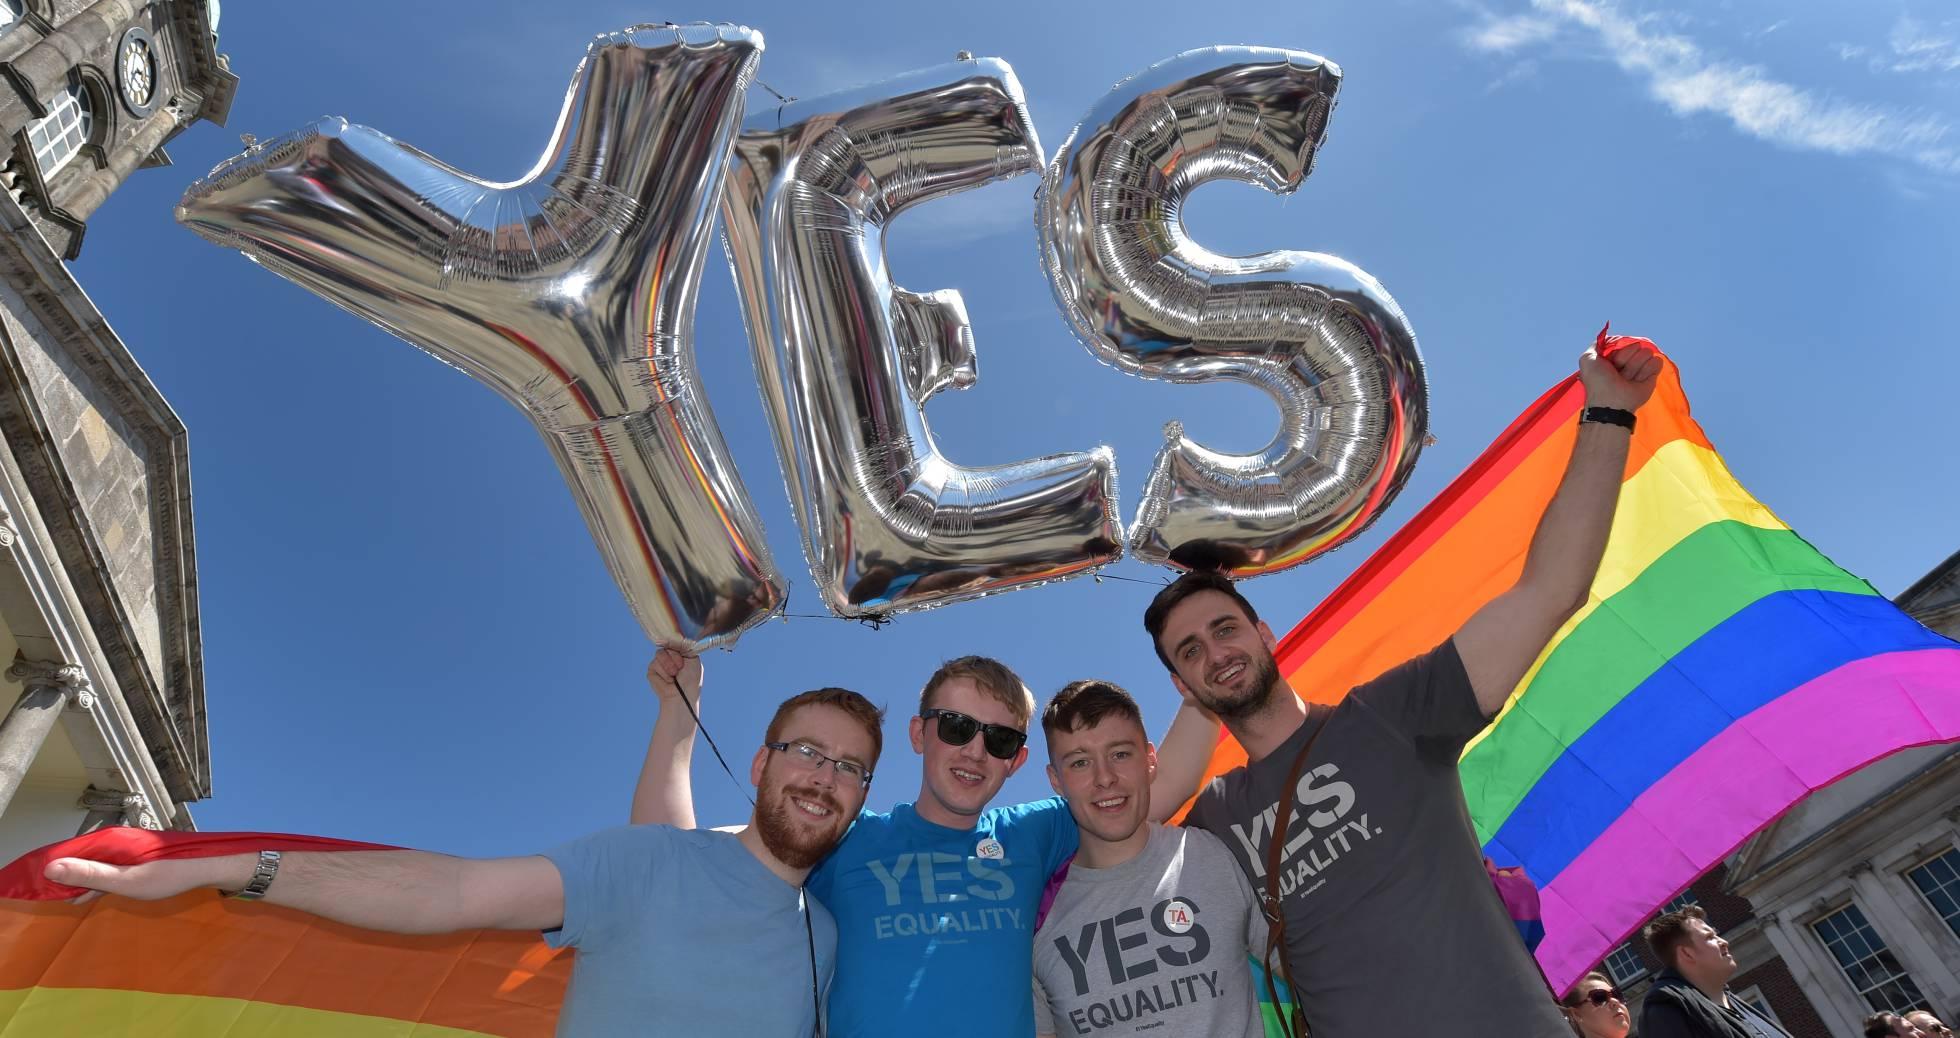 Gibraltar aprueba el matrimonio gay